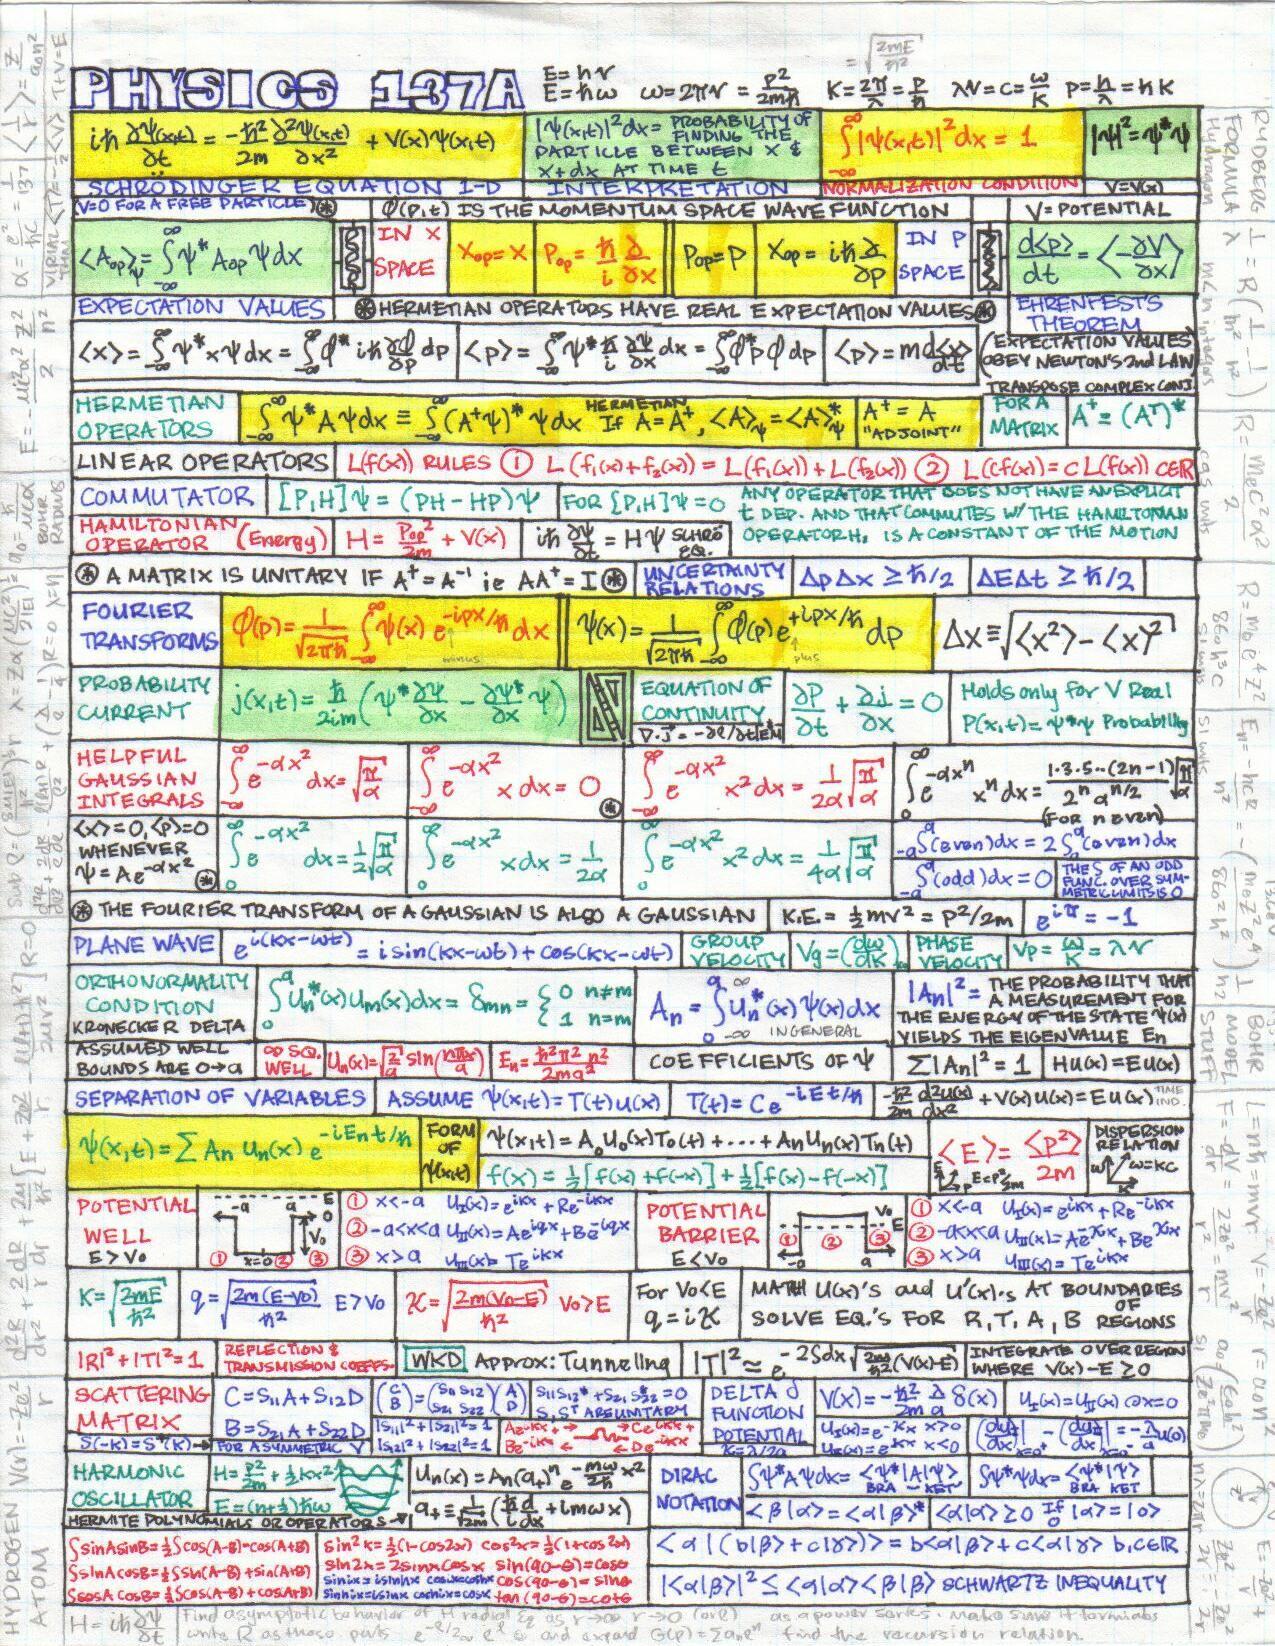 Math Worksheet Andy S Physics Math Astronomy Cheat Sheets Math Cheat Sheet For Algebra 1 Math Cheat Sheet Math Worksheet Math Methods [ 1646 x 1275 Pixel ]